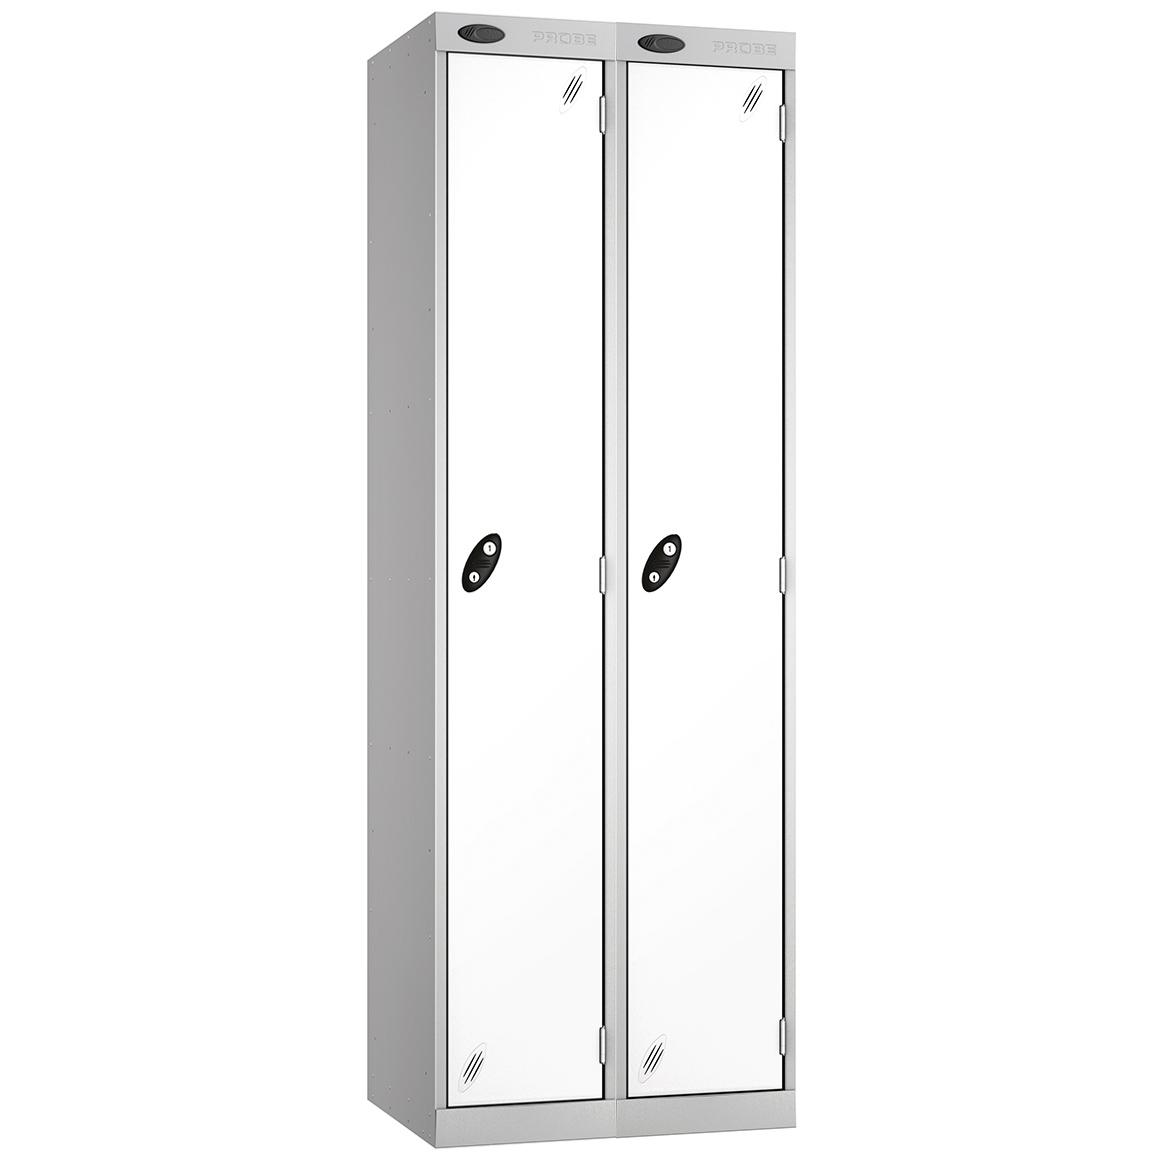 Probe Express Box Lockers - Nest 2 - 1 Tier Lockers